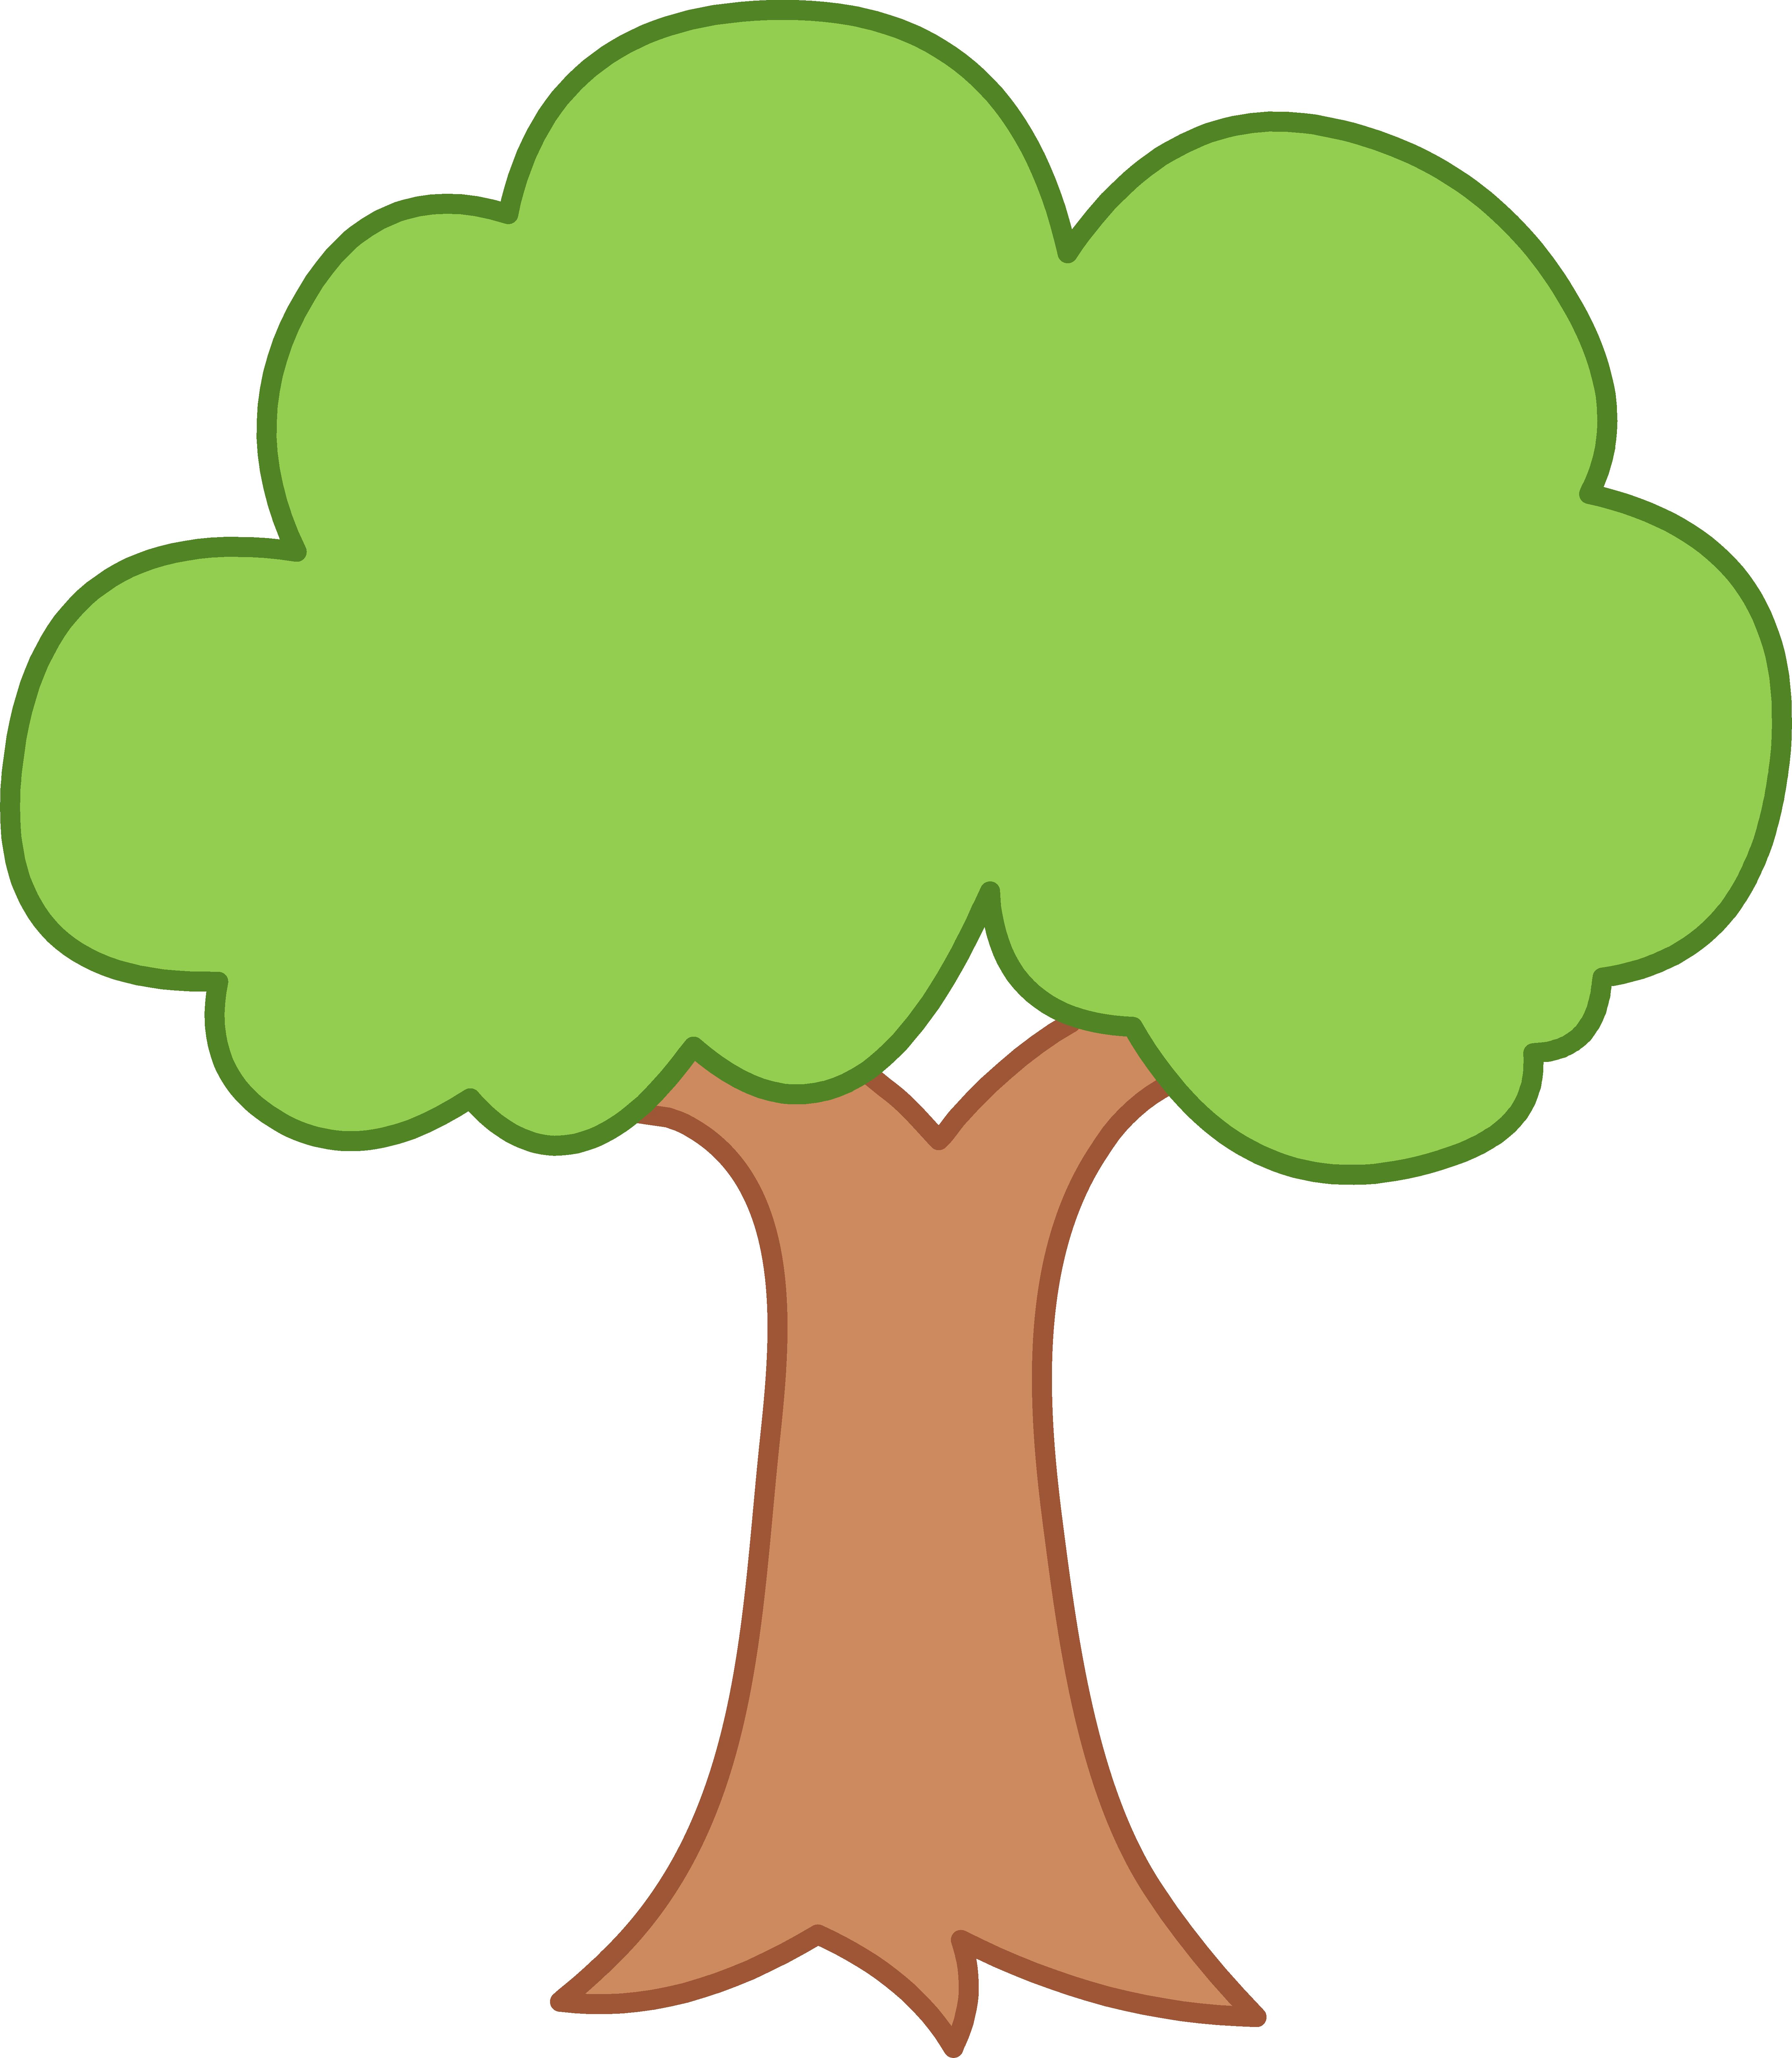 tree drawing clip art at getdrawings com free for personal use rh getdrawings com fall tree clipart free fall tree clip art black and white